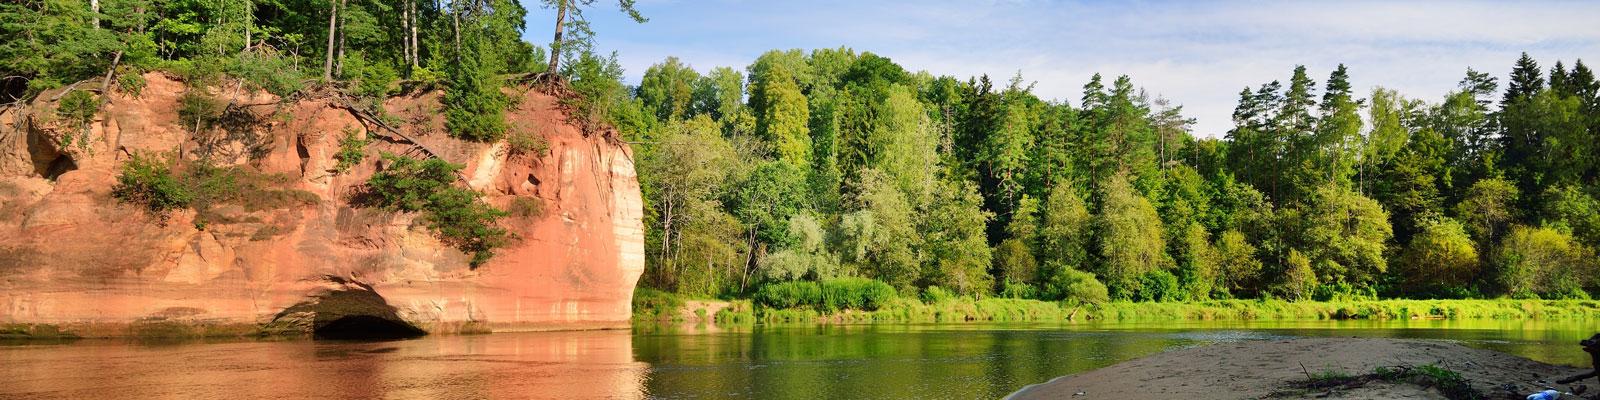 Latvia Vegan Travel Guide